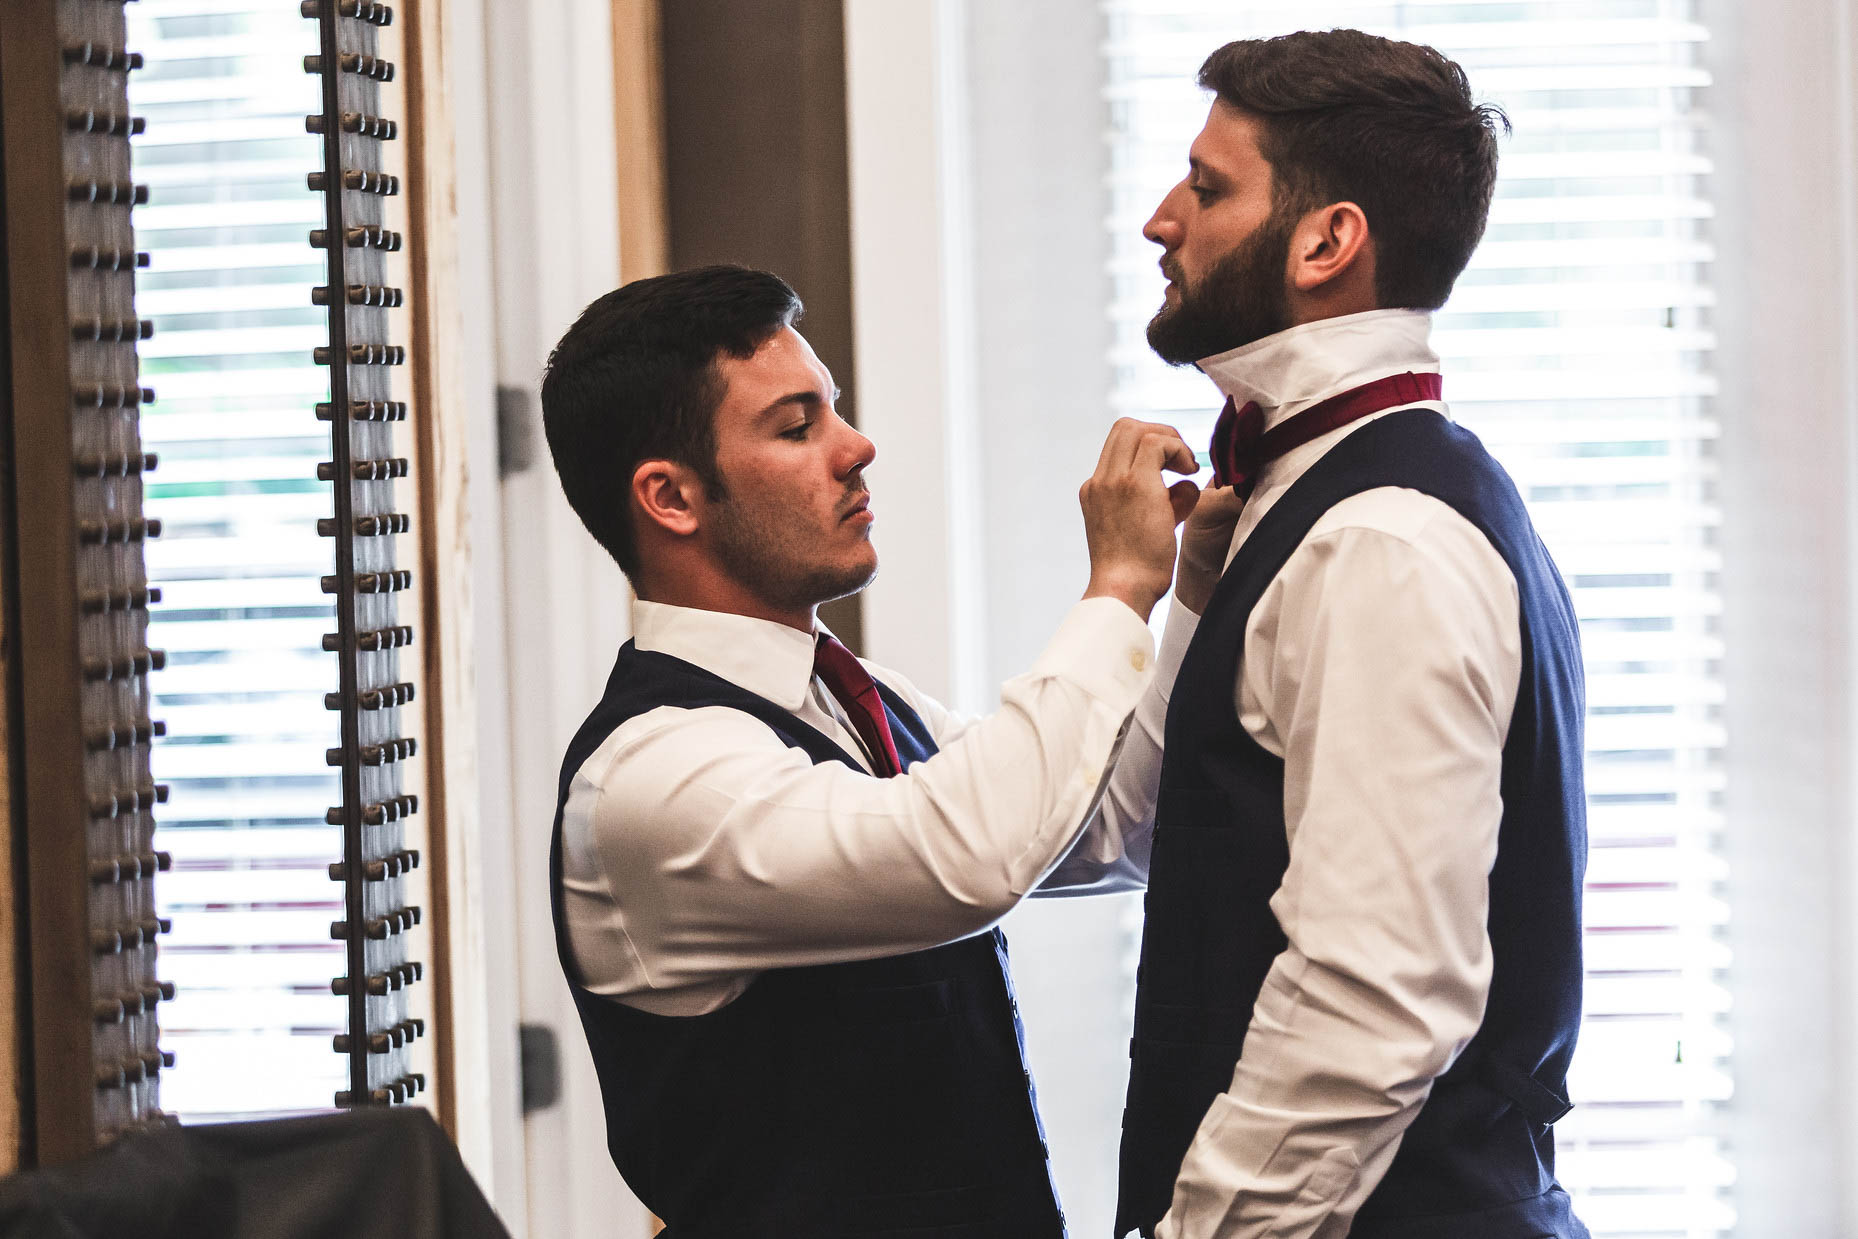 adam-szarmack-bowing-oaks-wedding-photographer-jacksonville-51.jpg